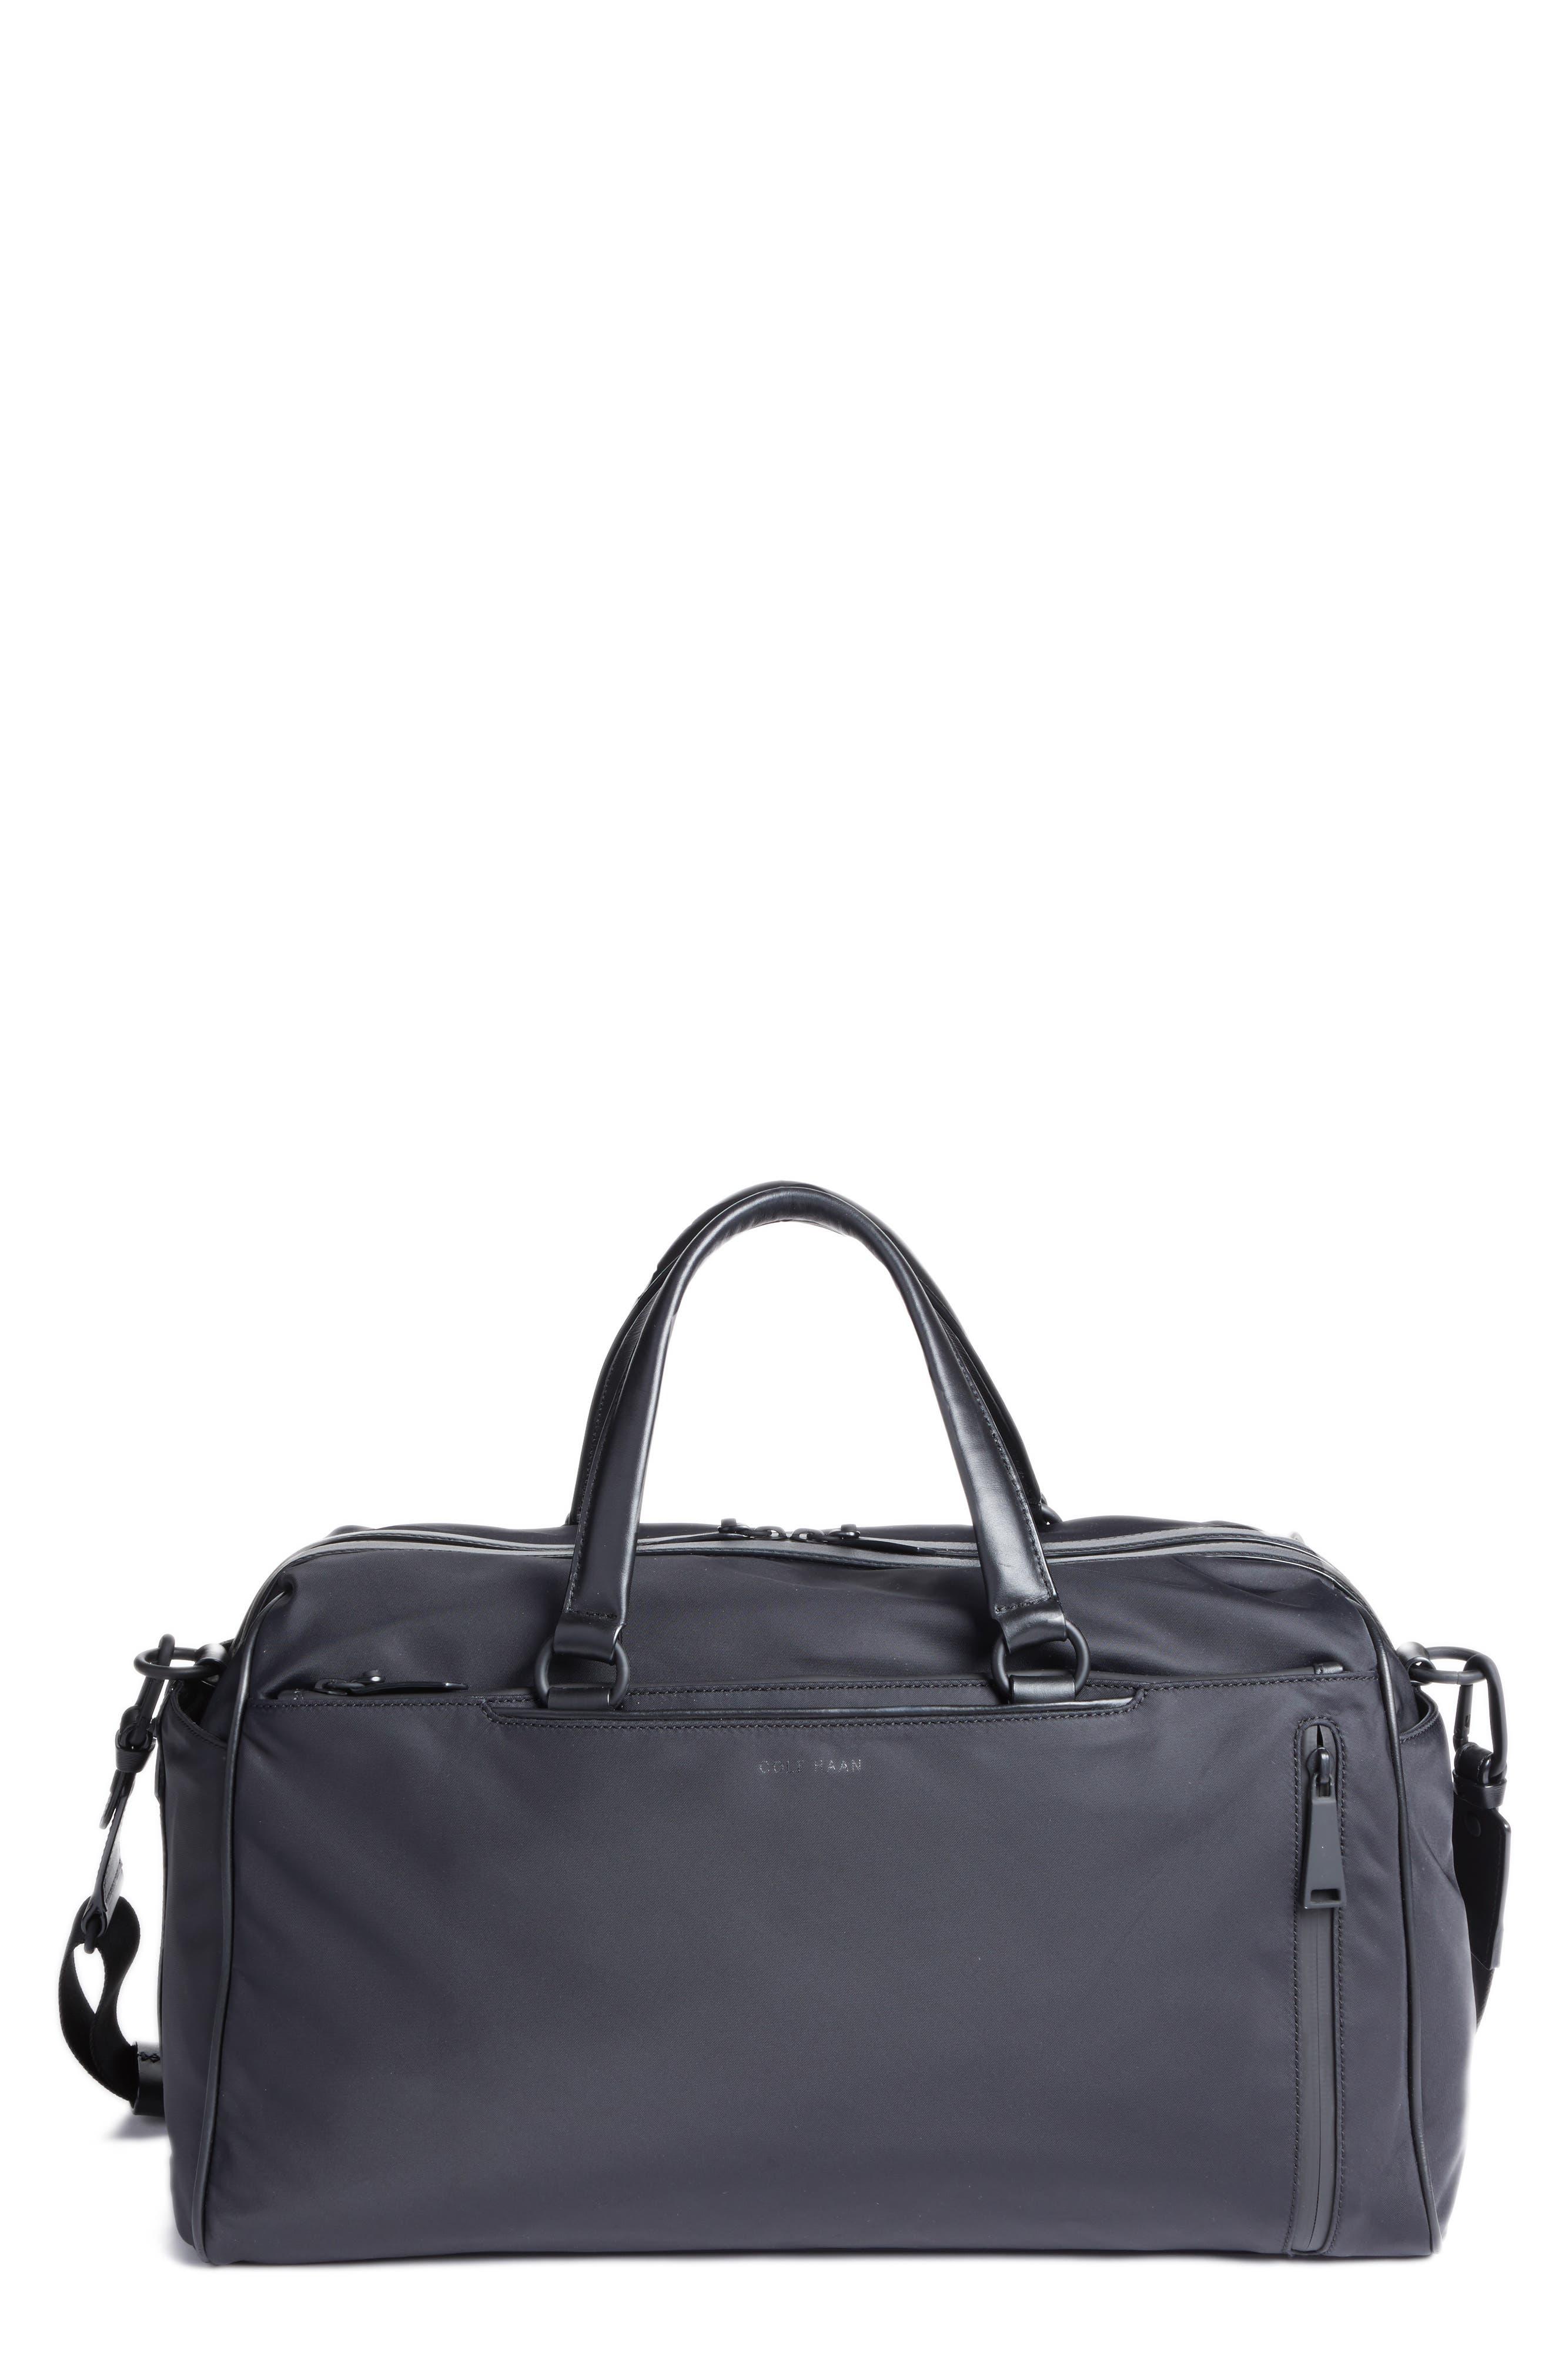 Cole Haan Grand Duffel Bag